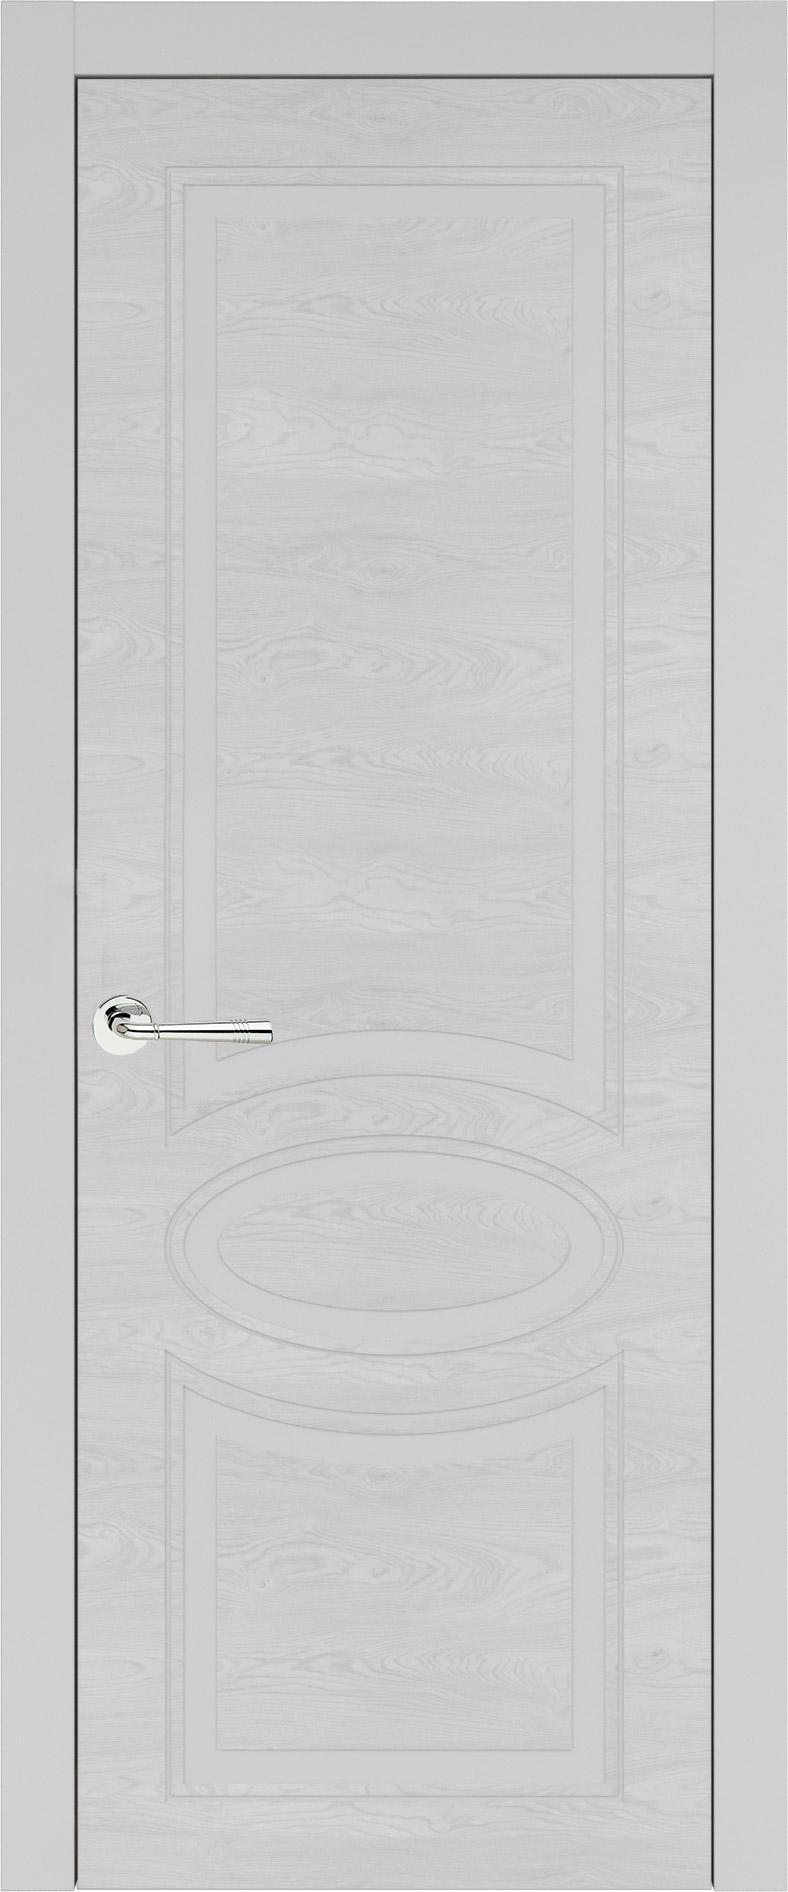 Florencia Neo Classic цвет - Серая эмаль по шпону (RAL 7047) Без стекла (ДГ)